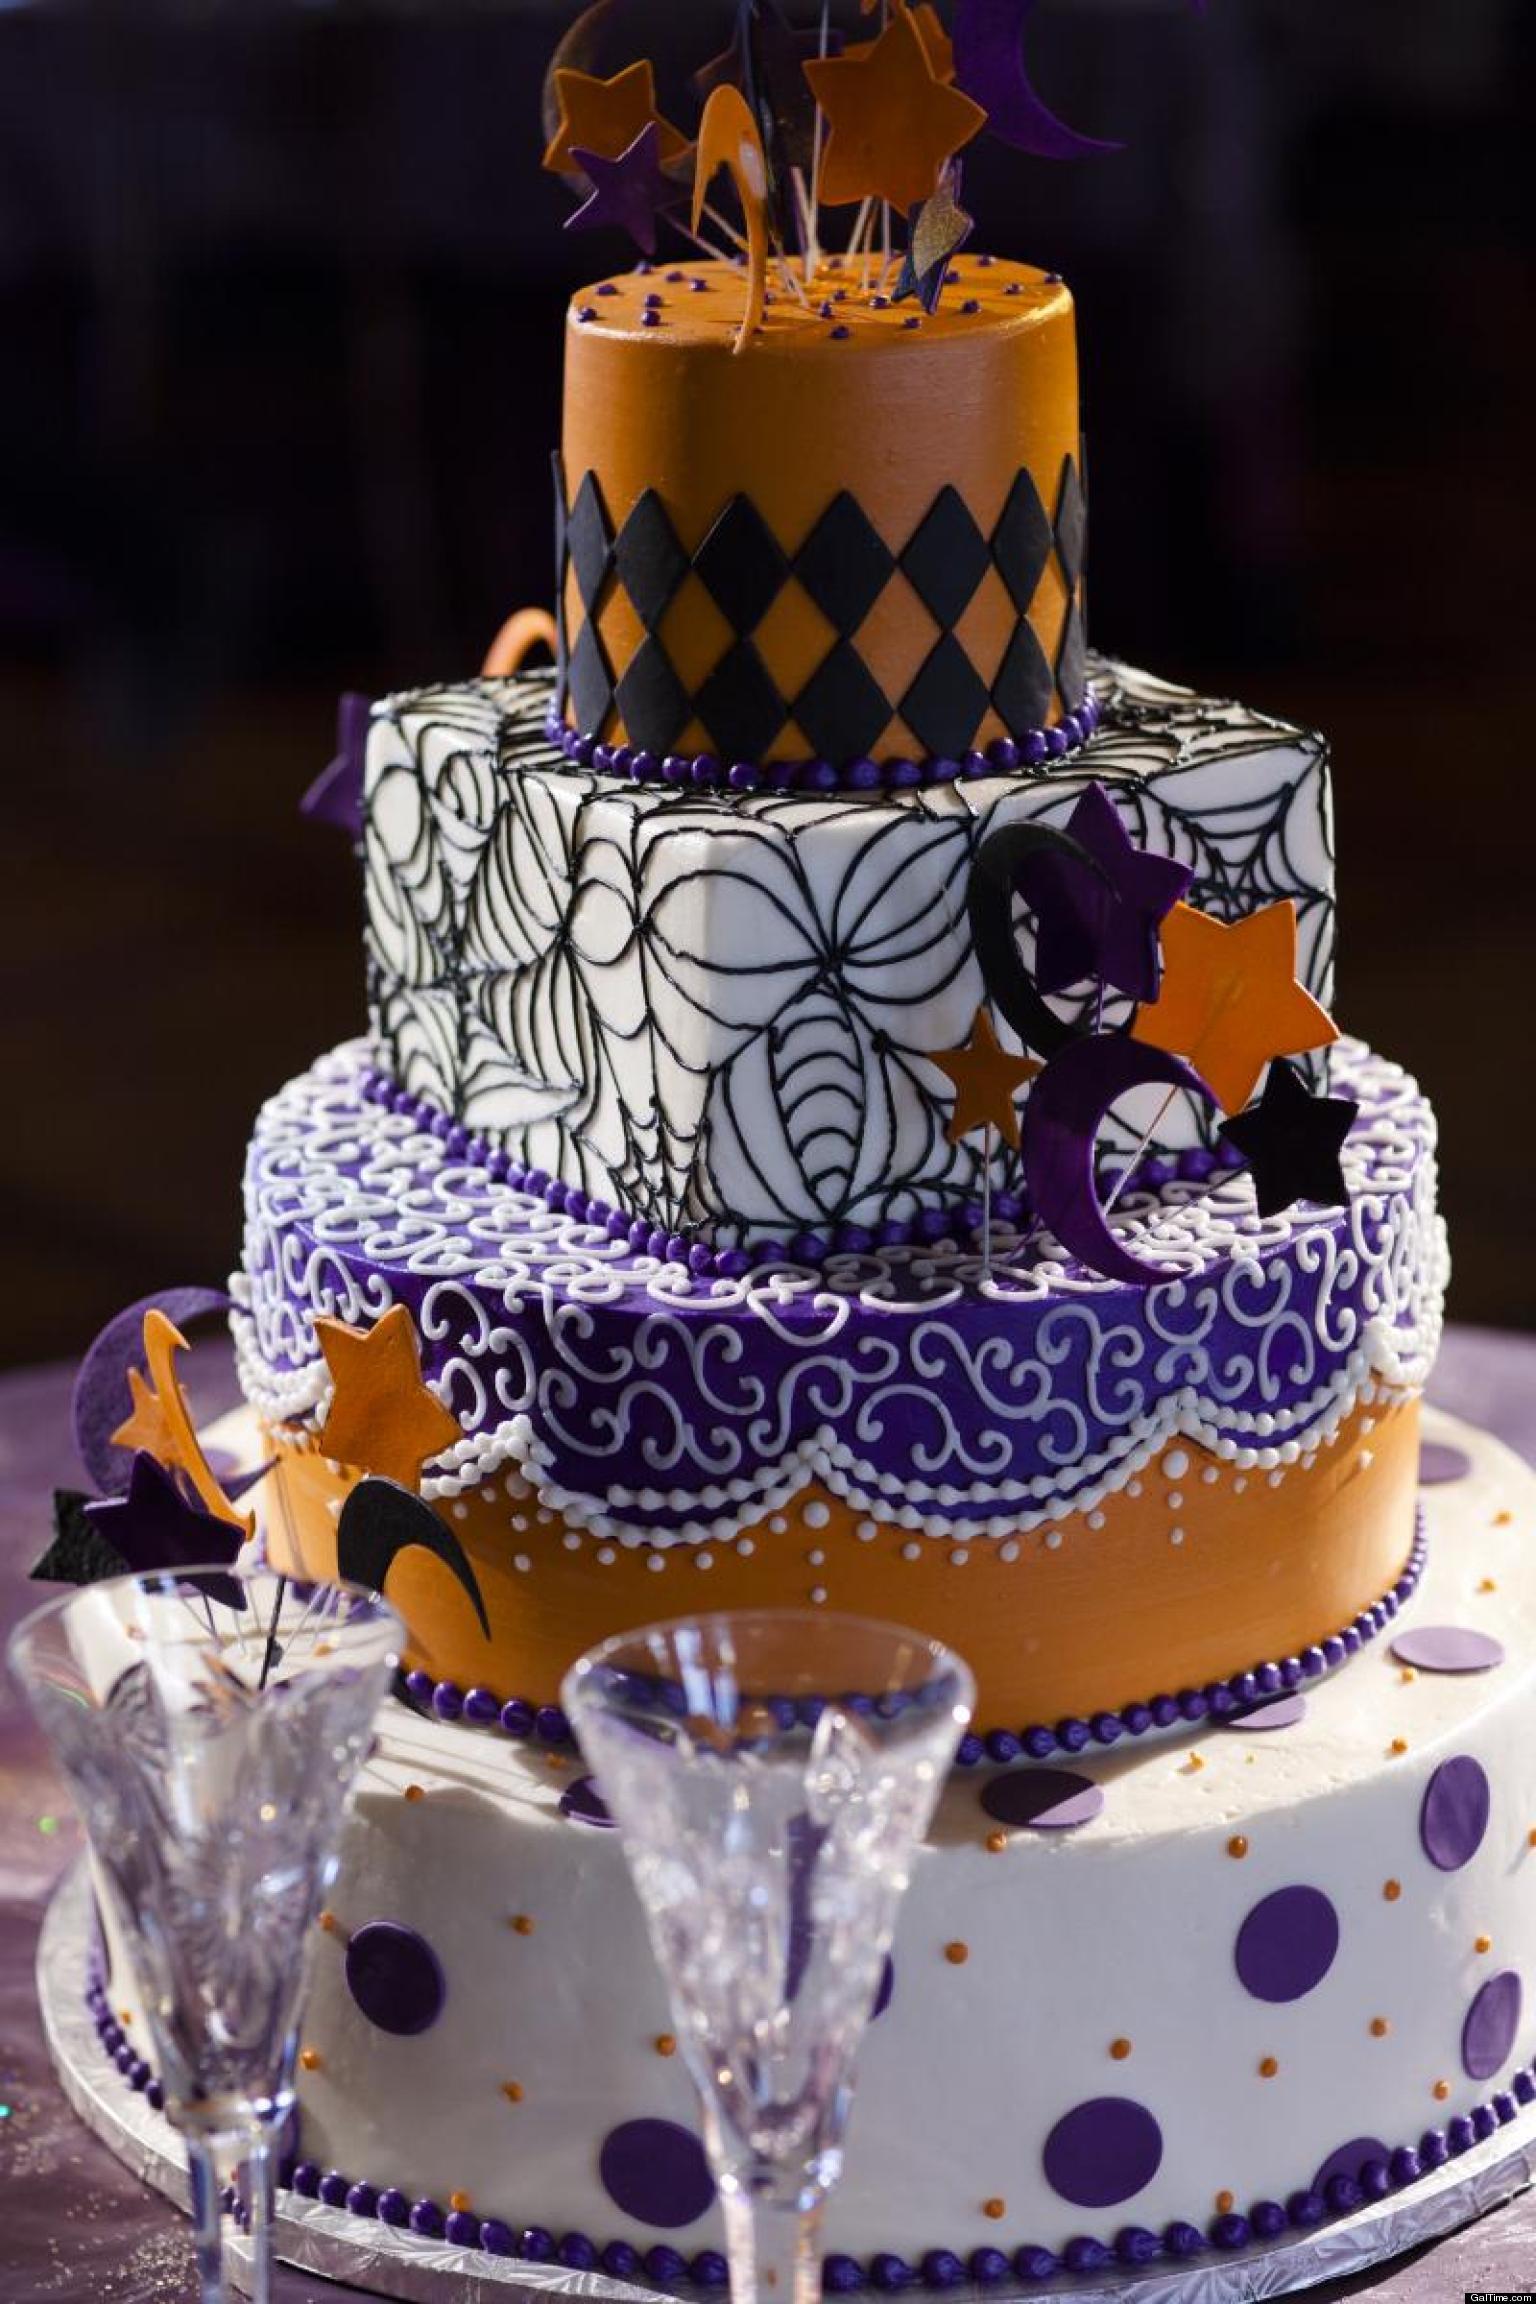 Halloween Themed Wedding Cakes  Halloween Weddings Fab Frightening PHOTOS